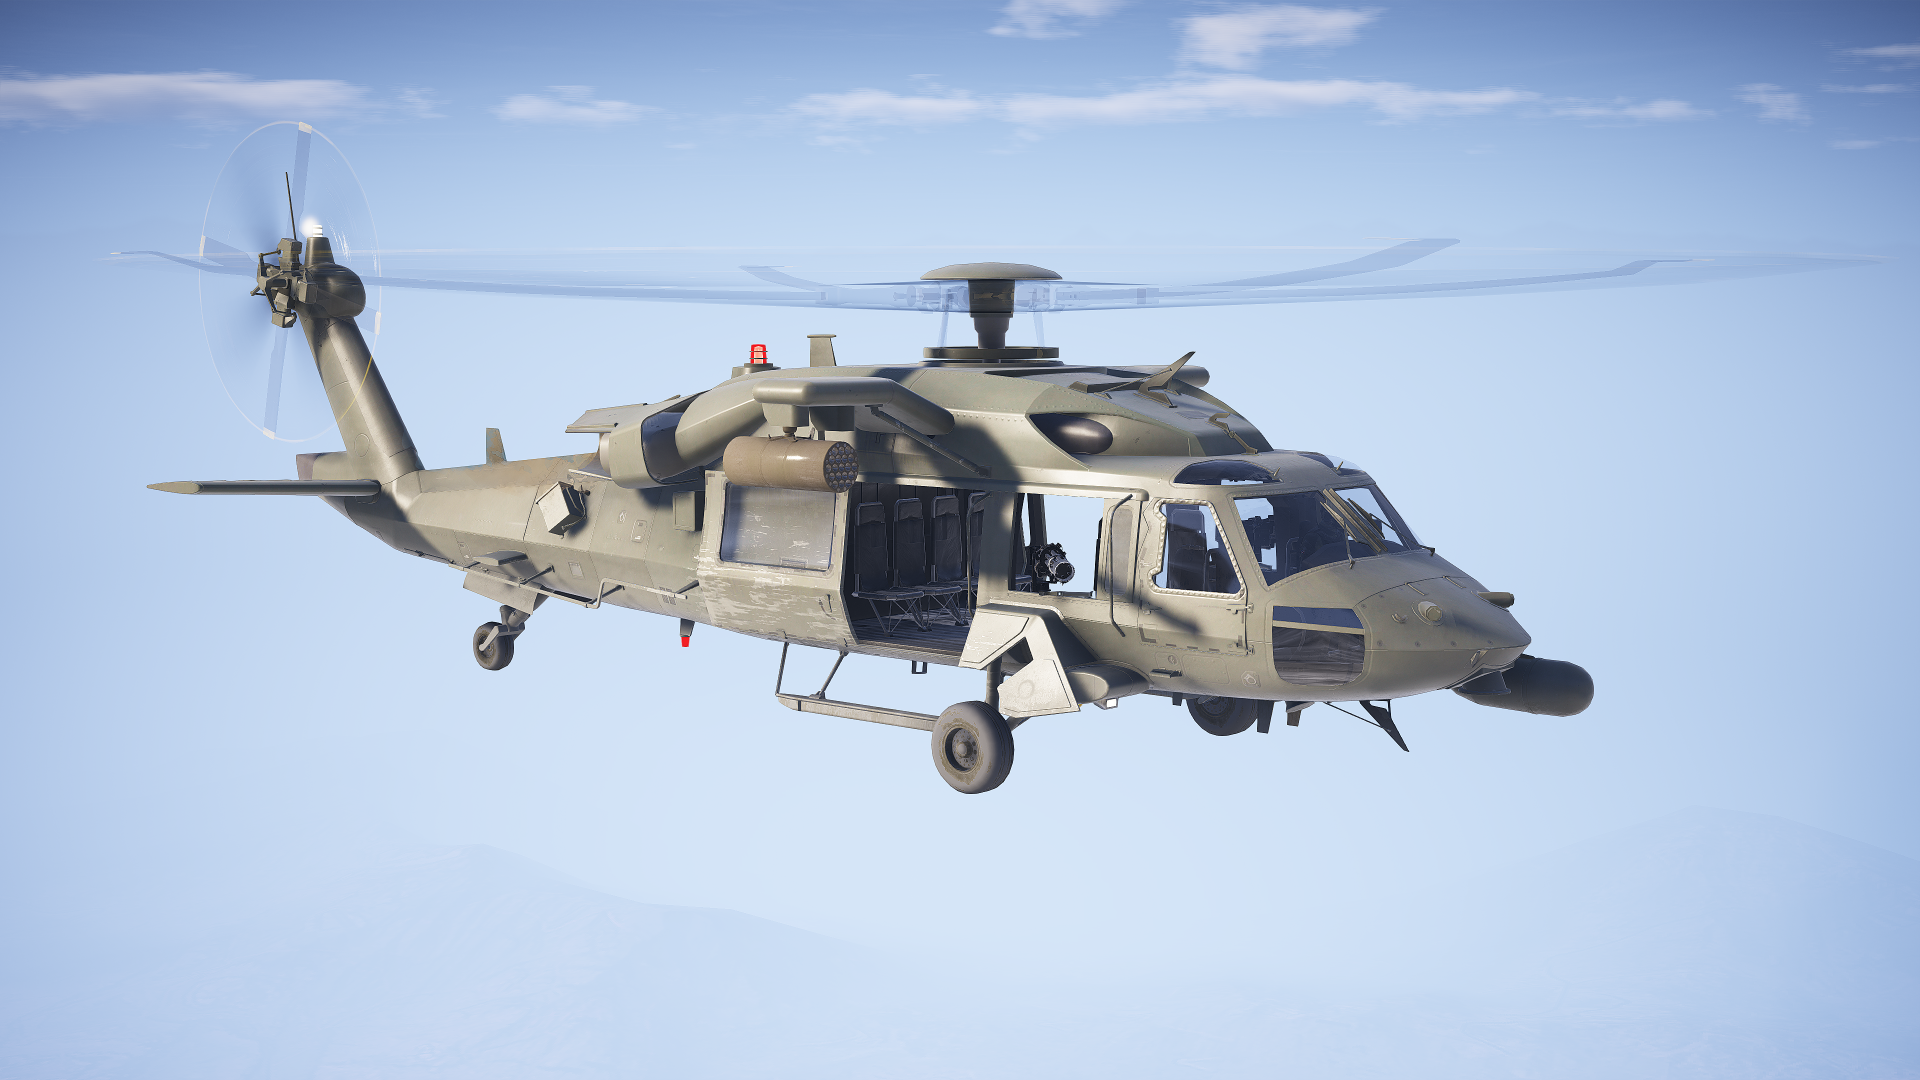 eab3862384d UH-60 Black Hawk | Ghost Recon Wiki | FANDOM powered by Wikia